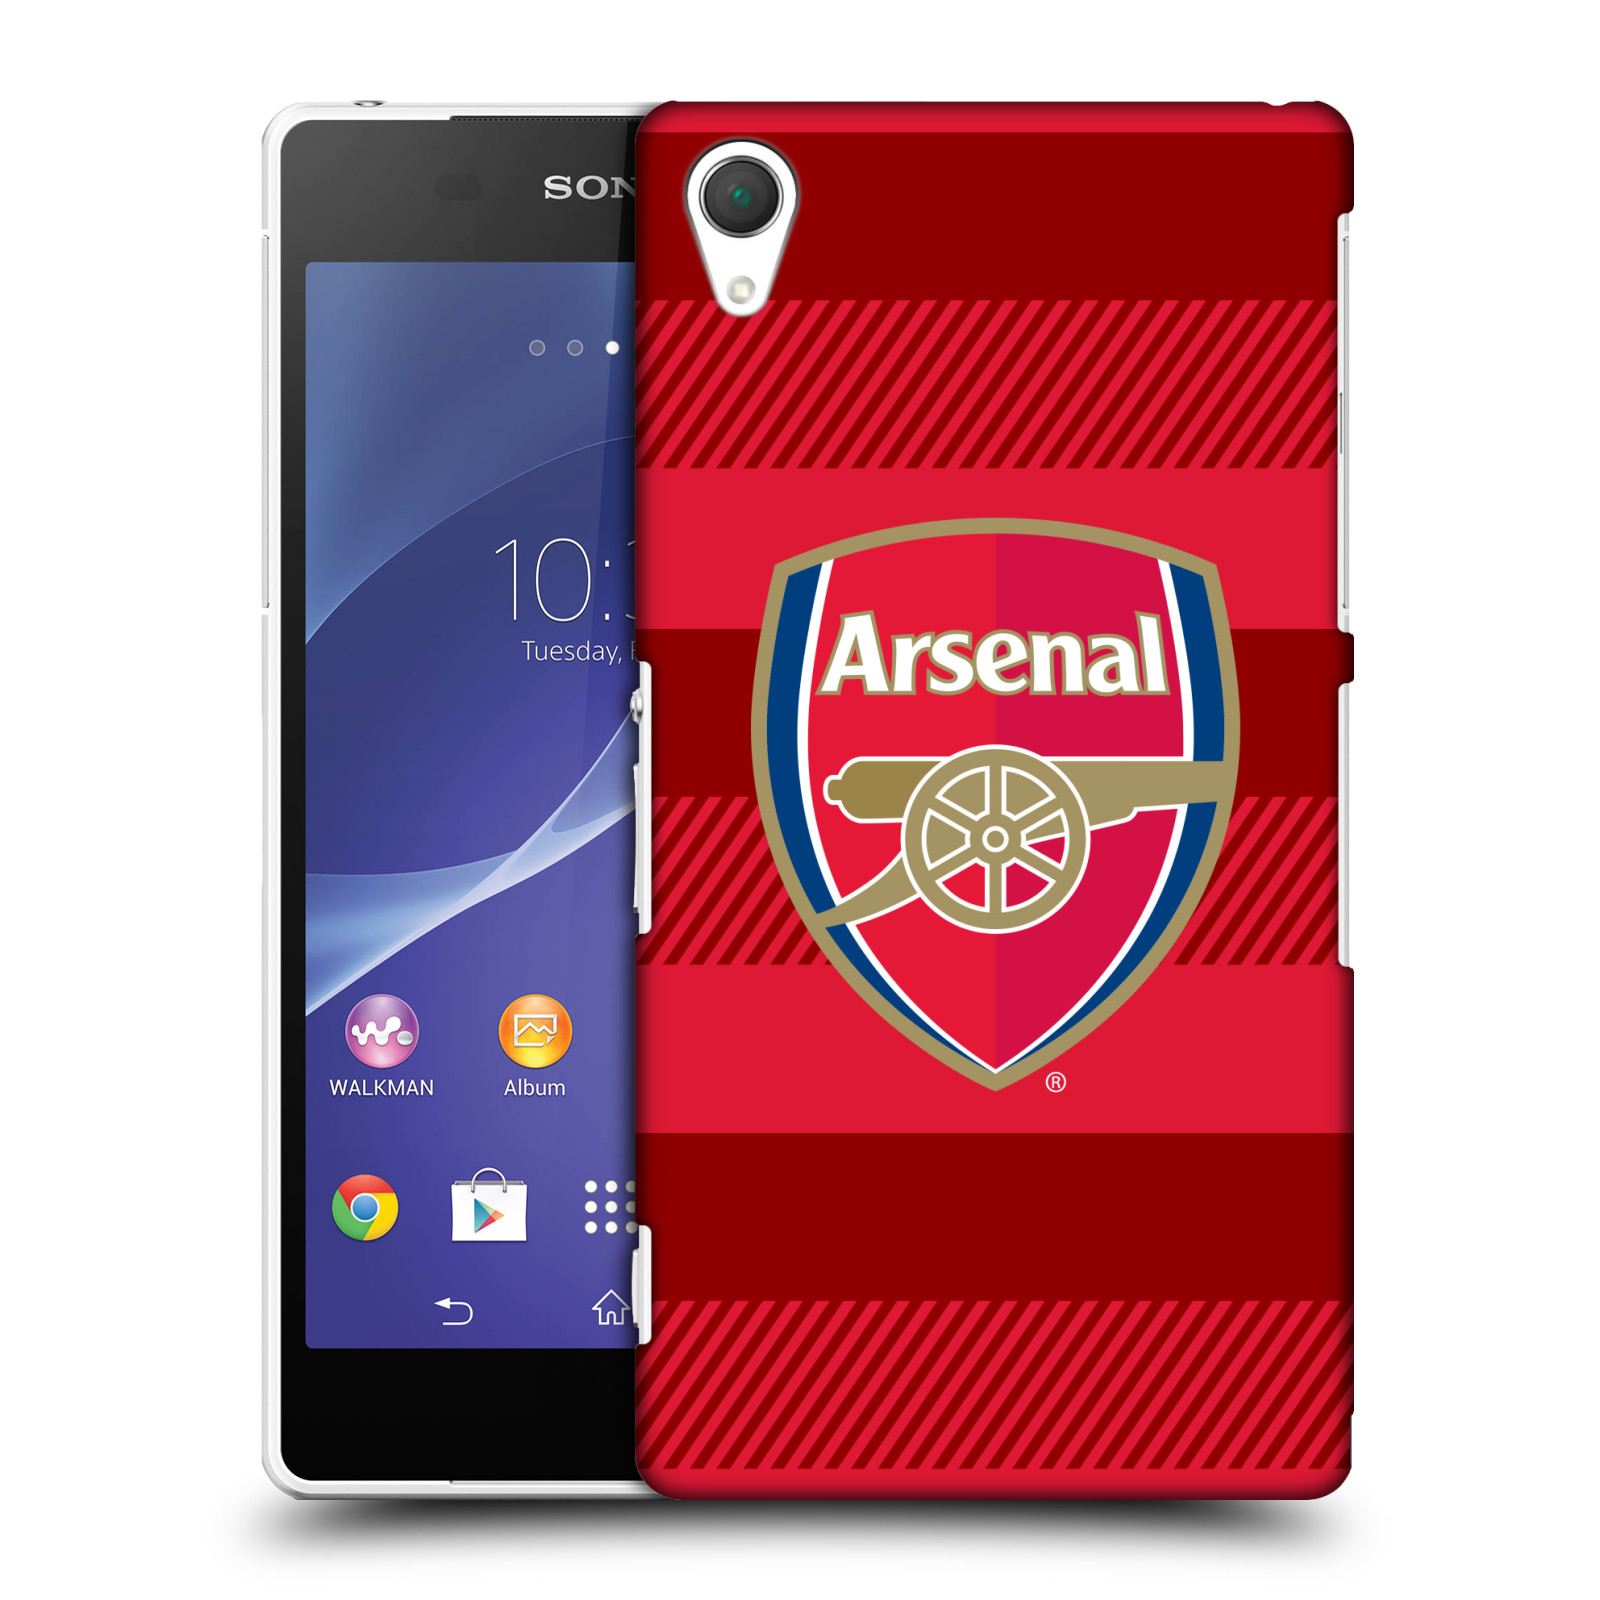 Plastové pouzdro na mobil Sony Xperia Z2 D6503 - Head Case - Arsenal FC - Logo s pruhy